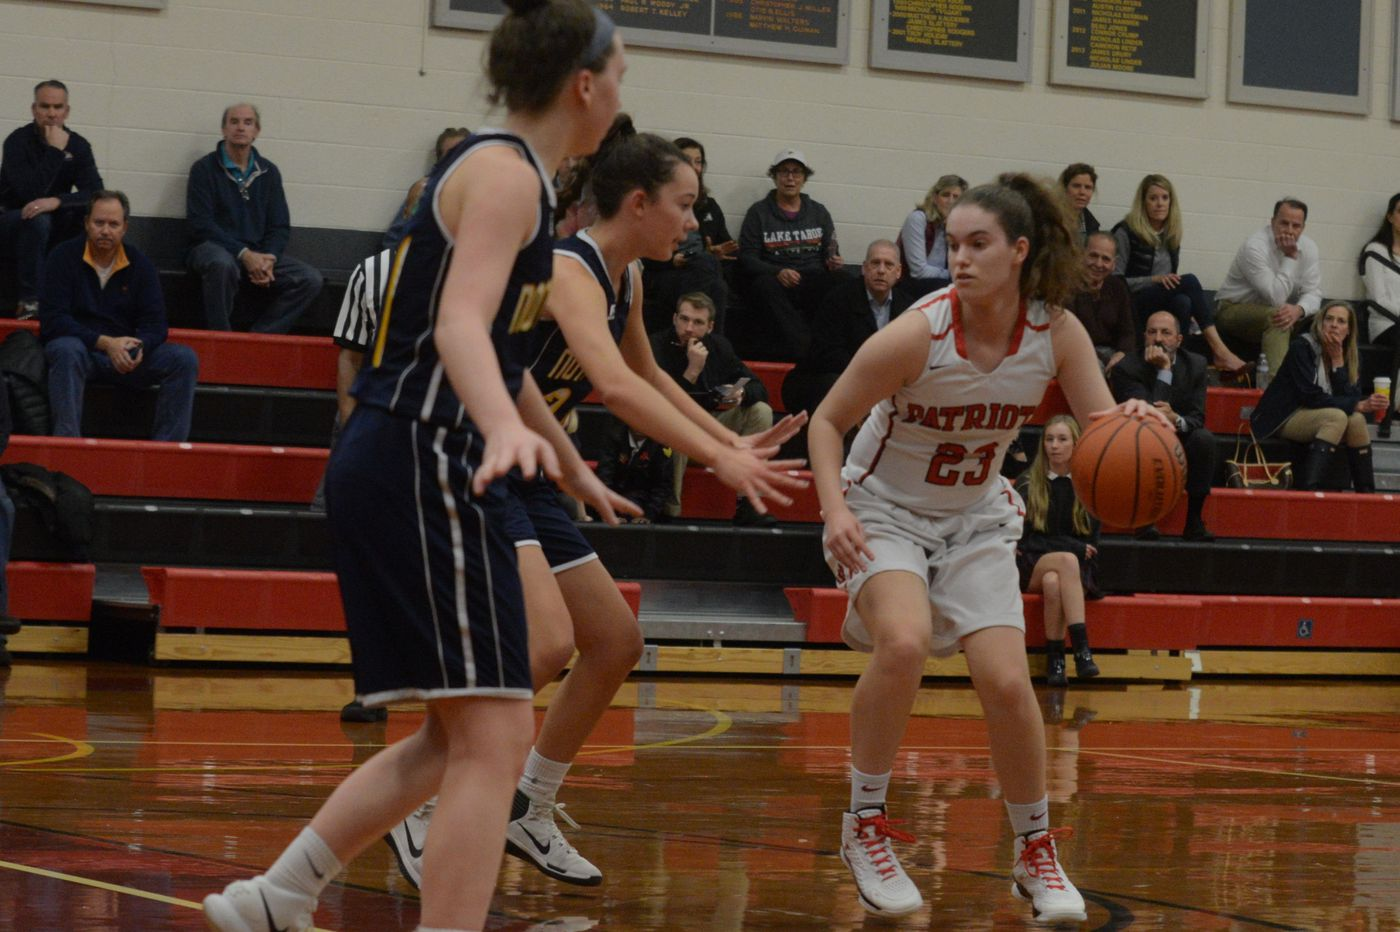 Friday's Southeastern Pa. roundup: Germantown Academy beats Notre Dame during Rachel Balzer's milestone night